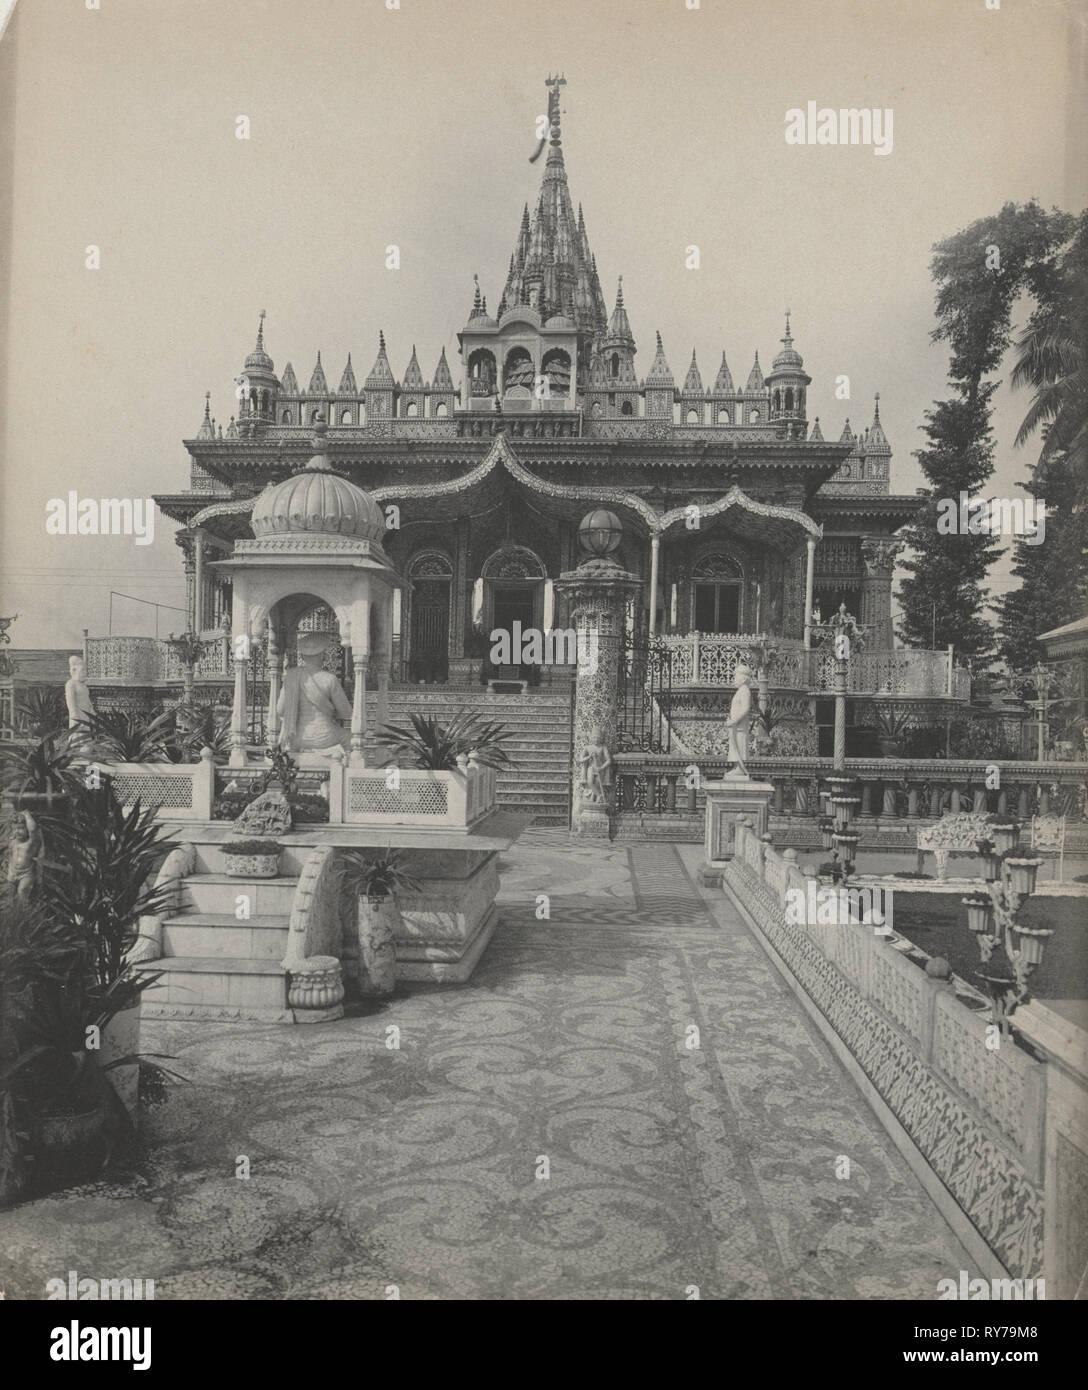 Pareshnath, Jain Temple, Calcutta, c. 1890s. Studio of A. W. A. Plâté Studio (Ceylonese). Platinum print; image: 28.8 x 24.2 cm (11 5/16 x 9 1/2 in.); paper: 28.8 x 24.2 cm (11 5/16 x 9 1/2 in.); matted: 50.8 x 40.6 cm (20 x 16 in Stock Photo